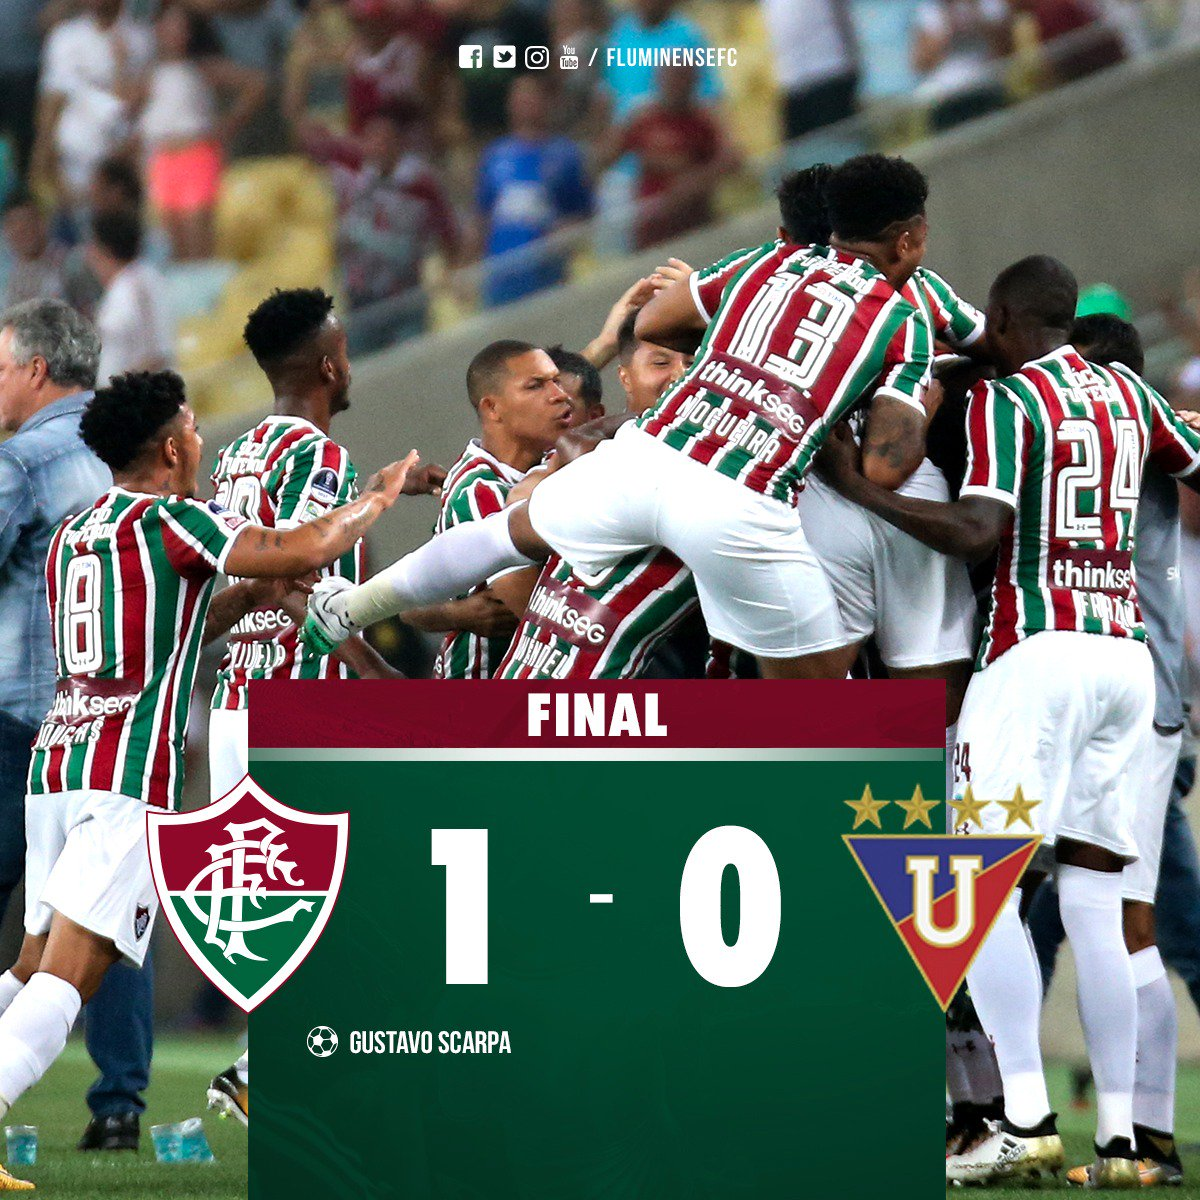 Largamos na frente! Fluminense bate a LDU no Maracanã #FLUxLDU